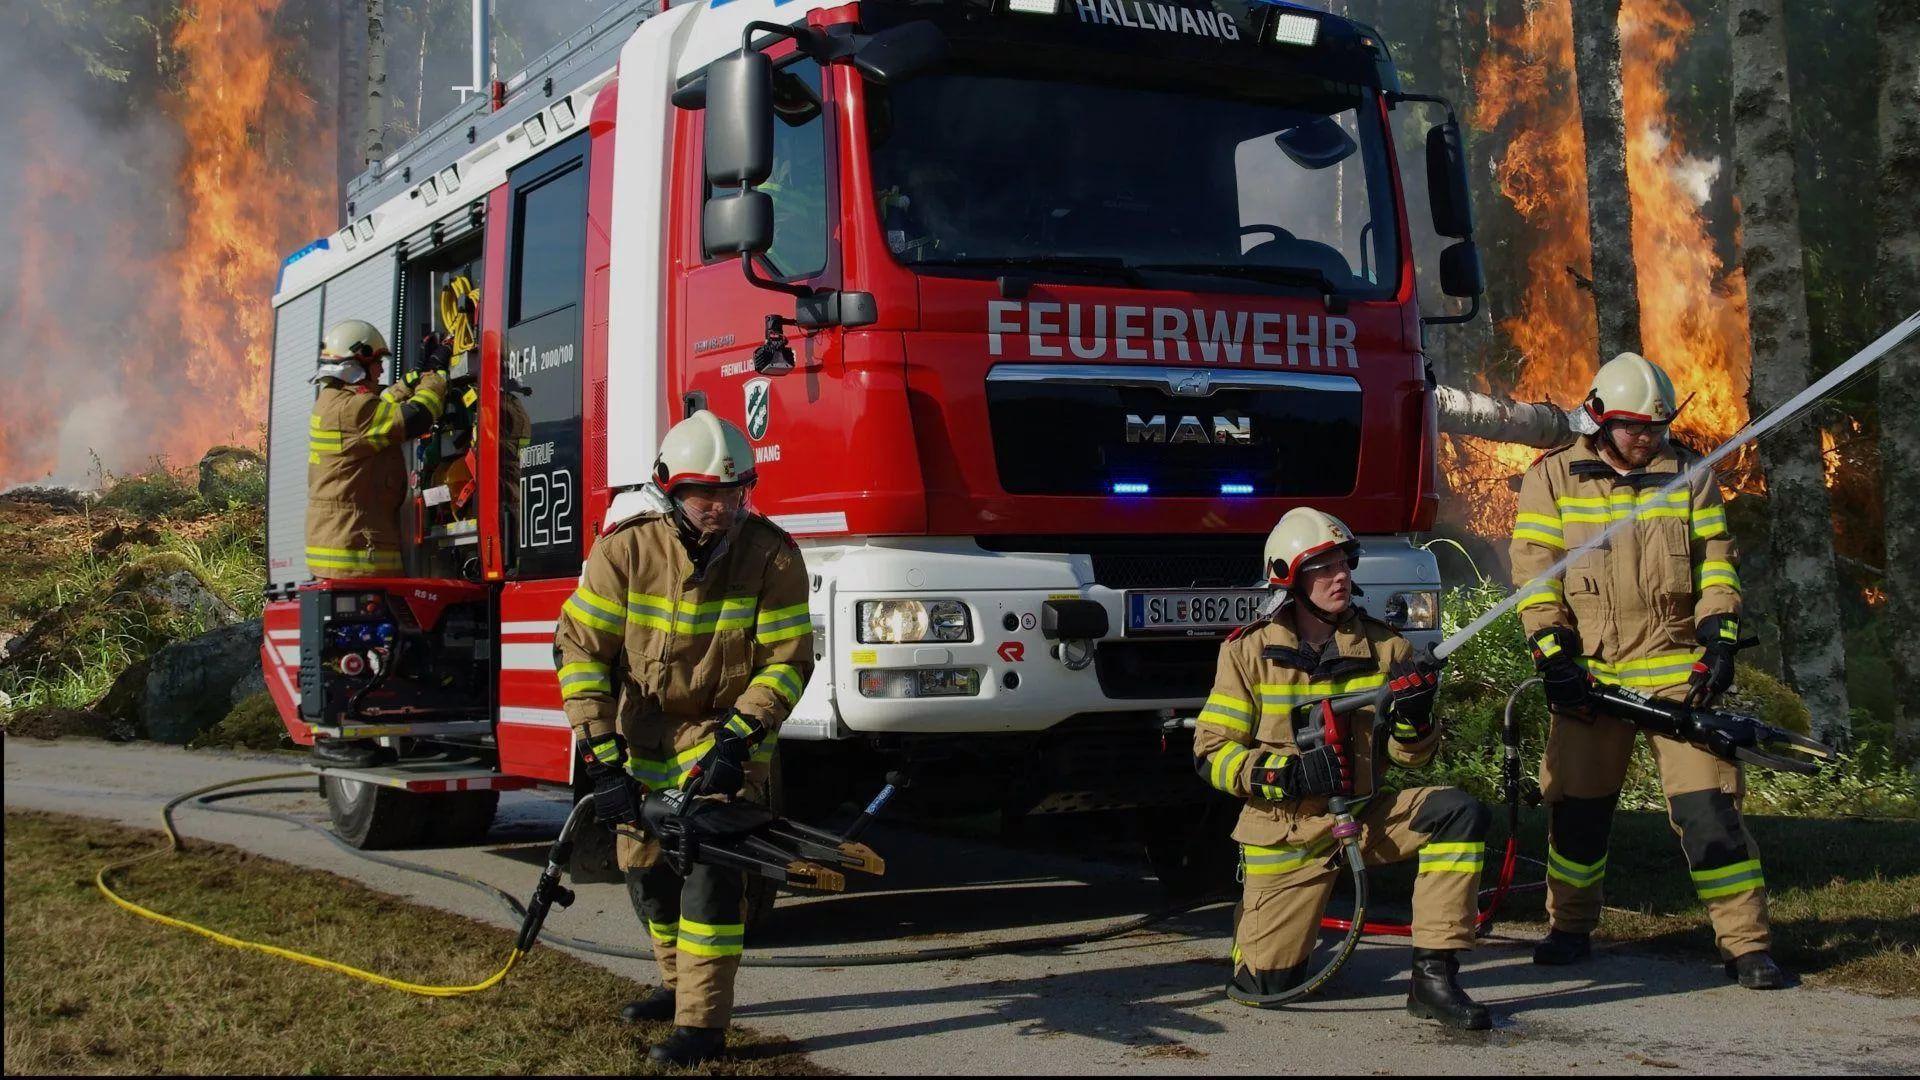 Firefighter wallpaper theme